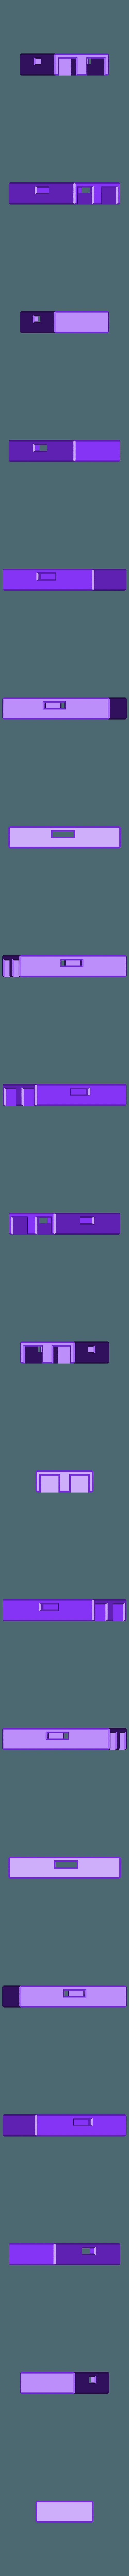 battholder pulse 5000.stl Télécharger fichier STL Lipo 2S RX battery holder Pulse 5000 • Plan imprimable en 3D, 3DDrone